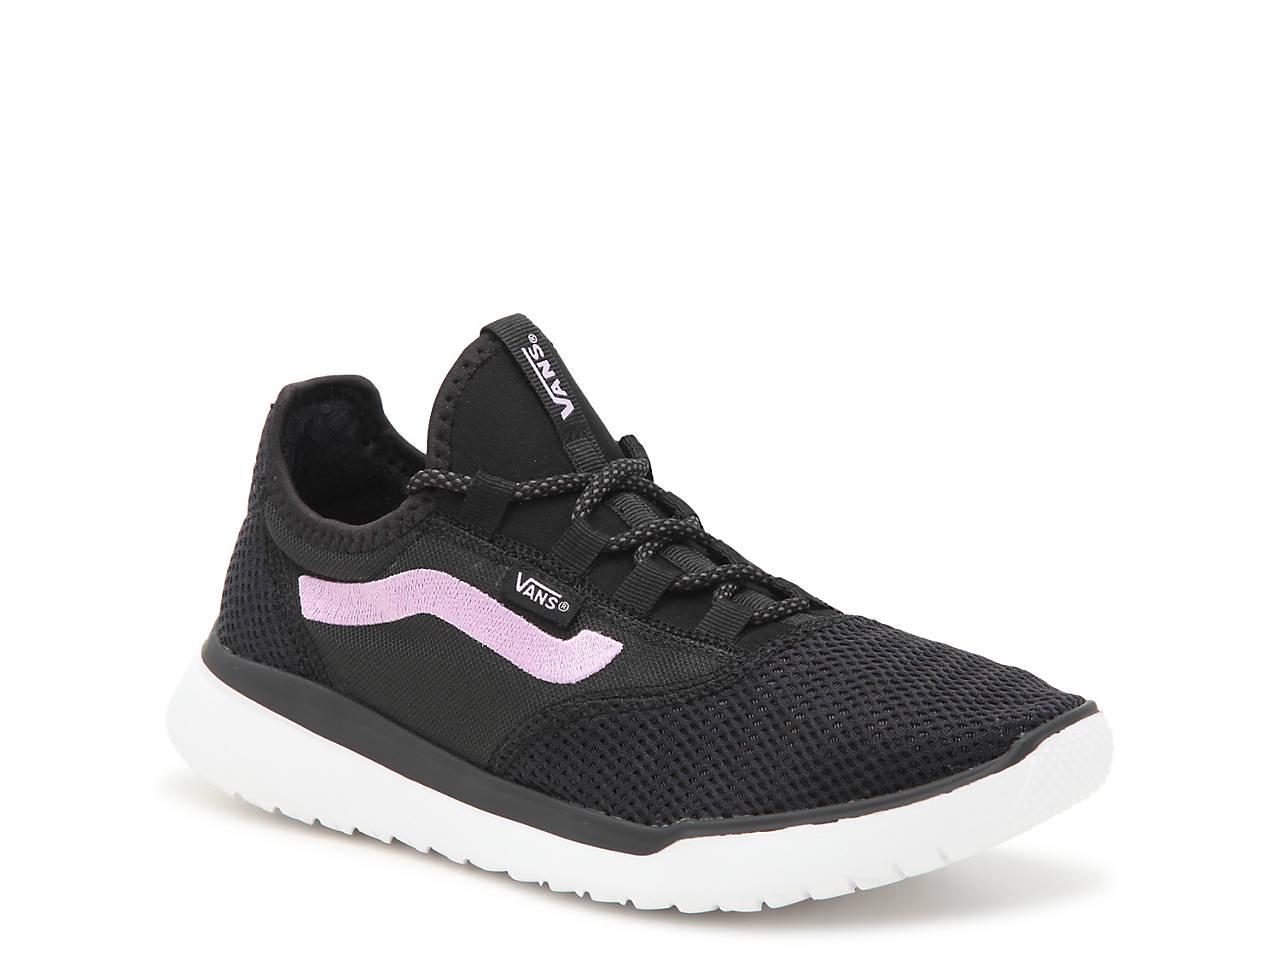 61ecf3aef643 Vans Cerus Lite Sneaker - Women s Women s Shoes